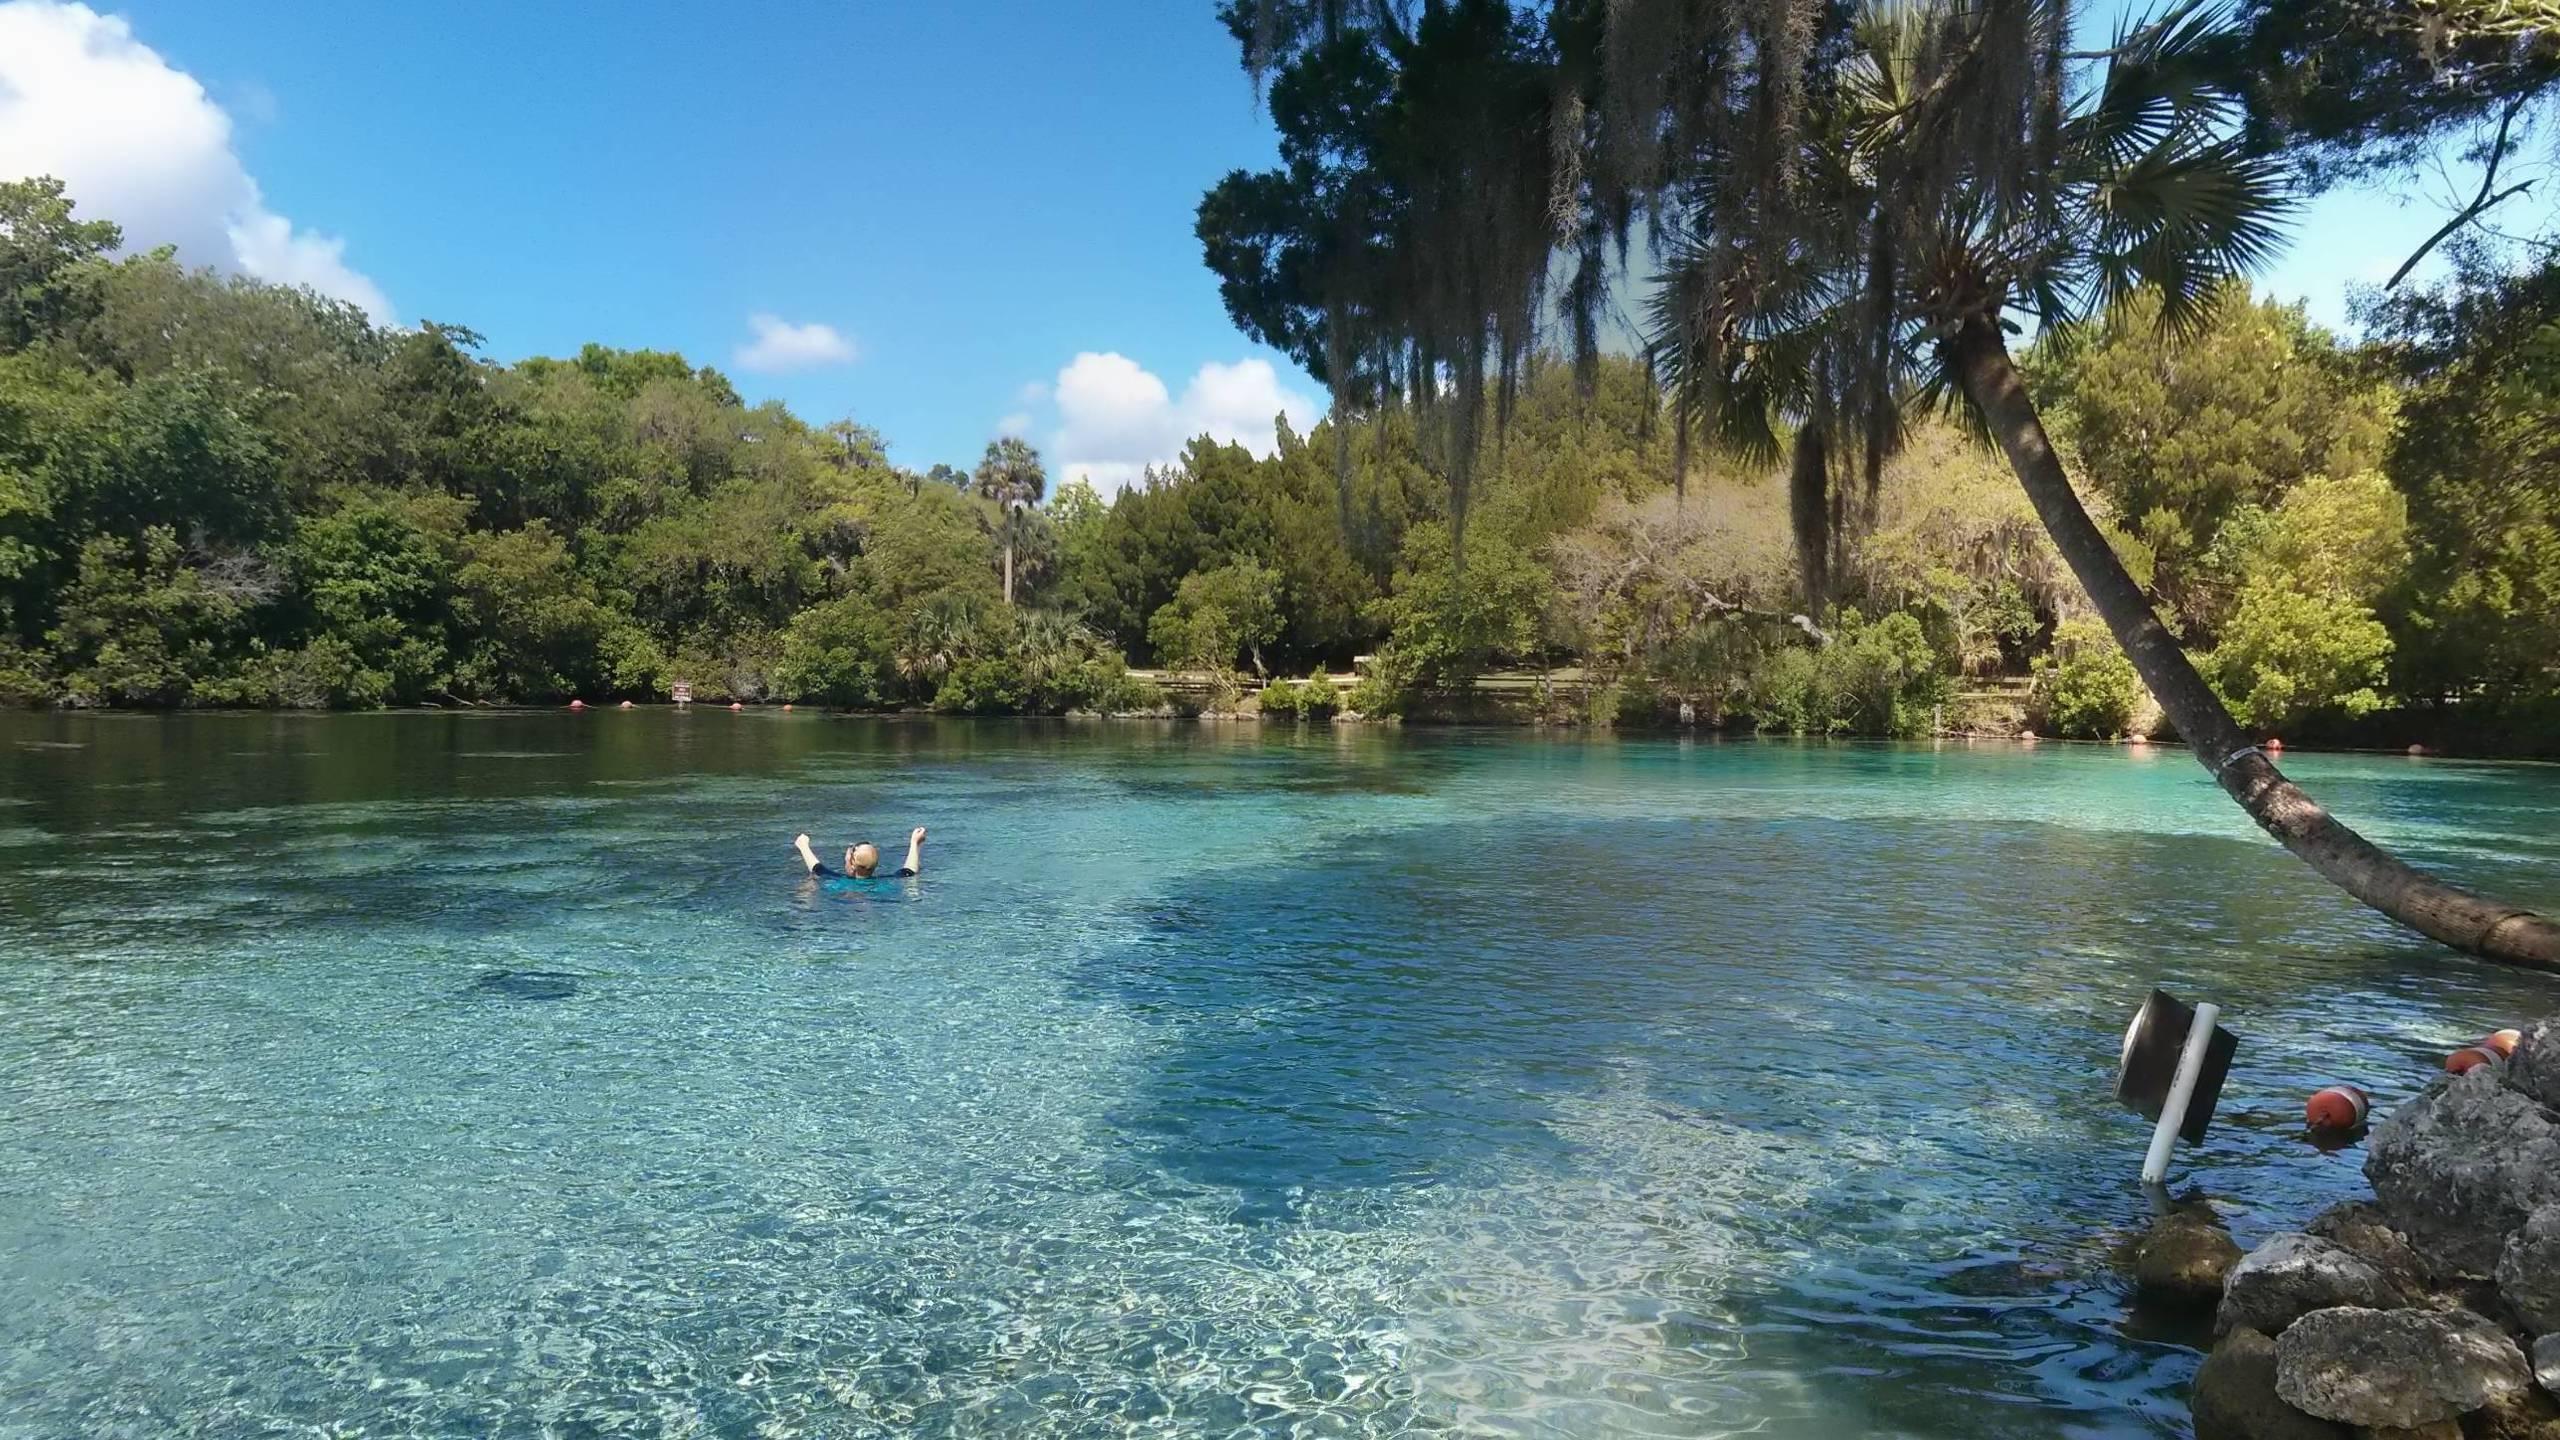 Glen Spring Ocala National Forest Ocala Florida iimgurcom 2560x1440